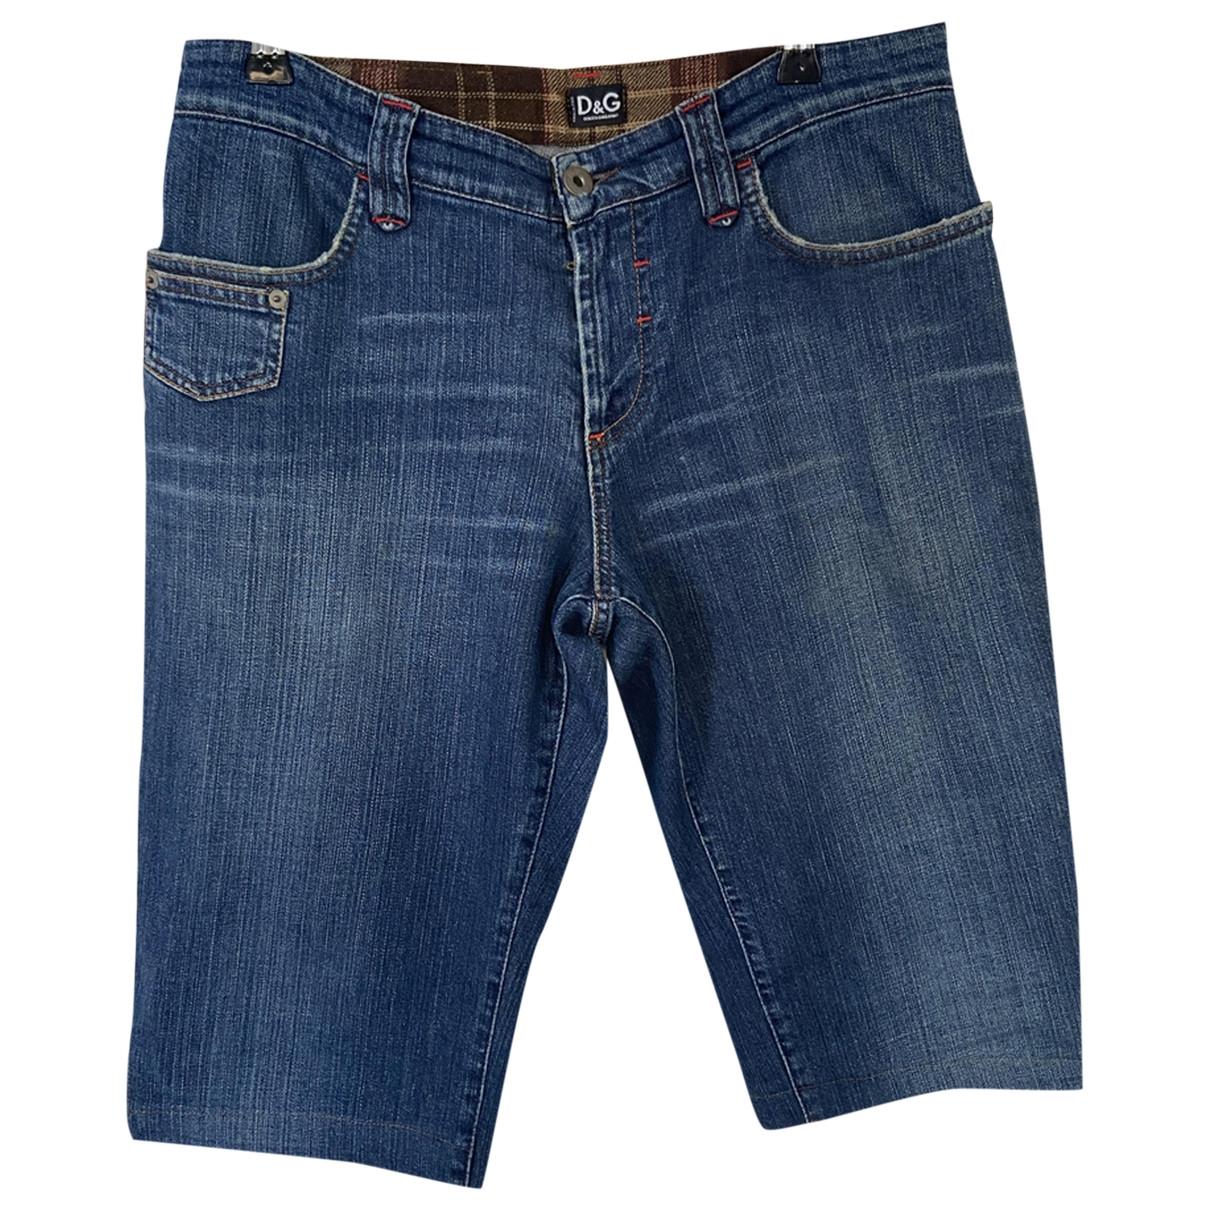 D&g \N Shorts in  Blau Denim - Jeans